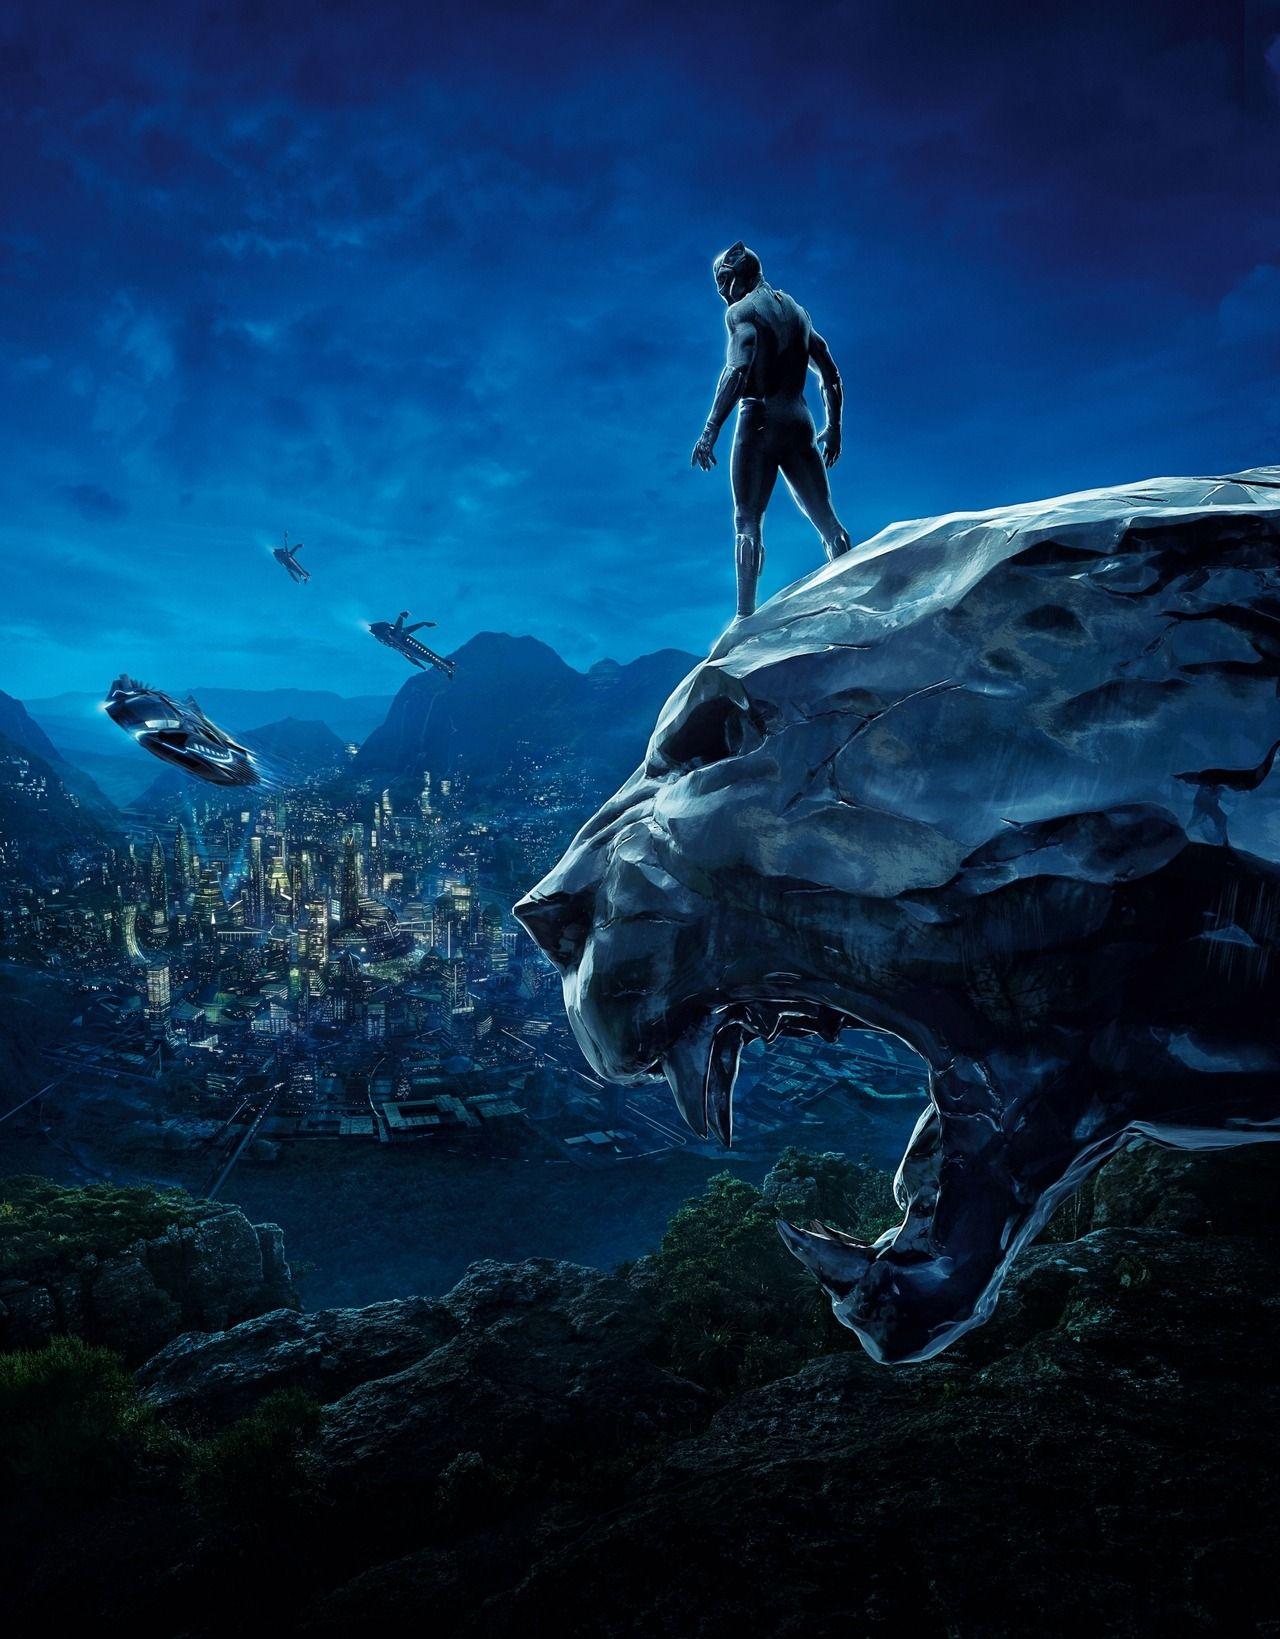 Excellent Black Panther (2018) Fan Poster!